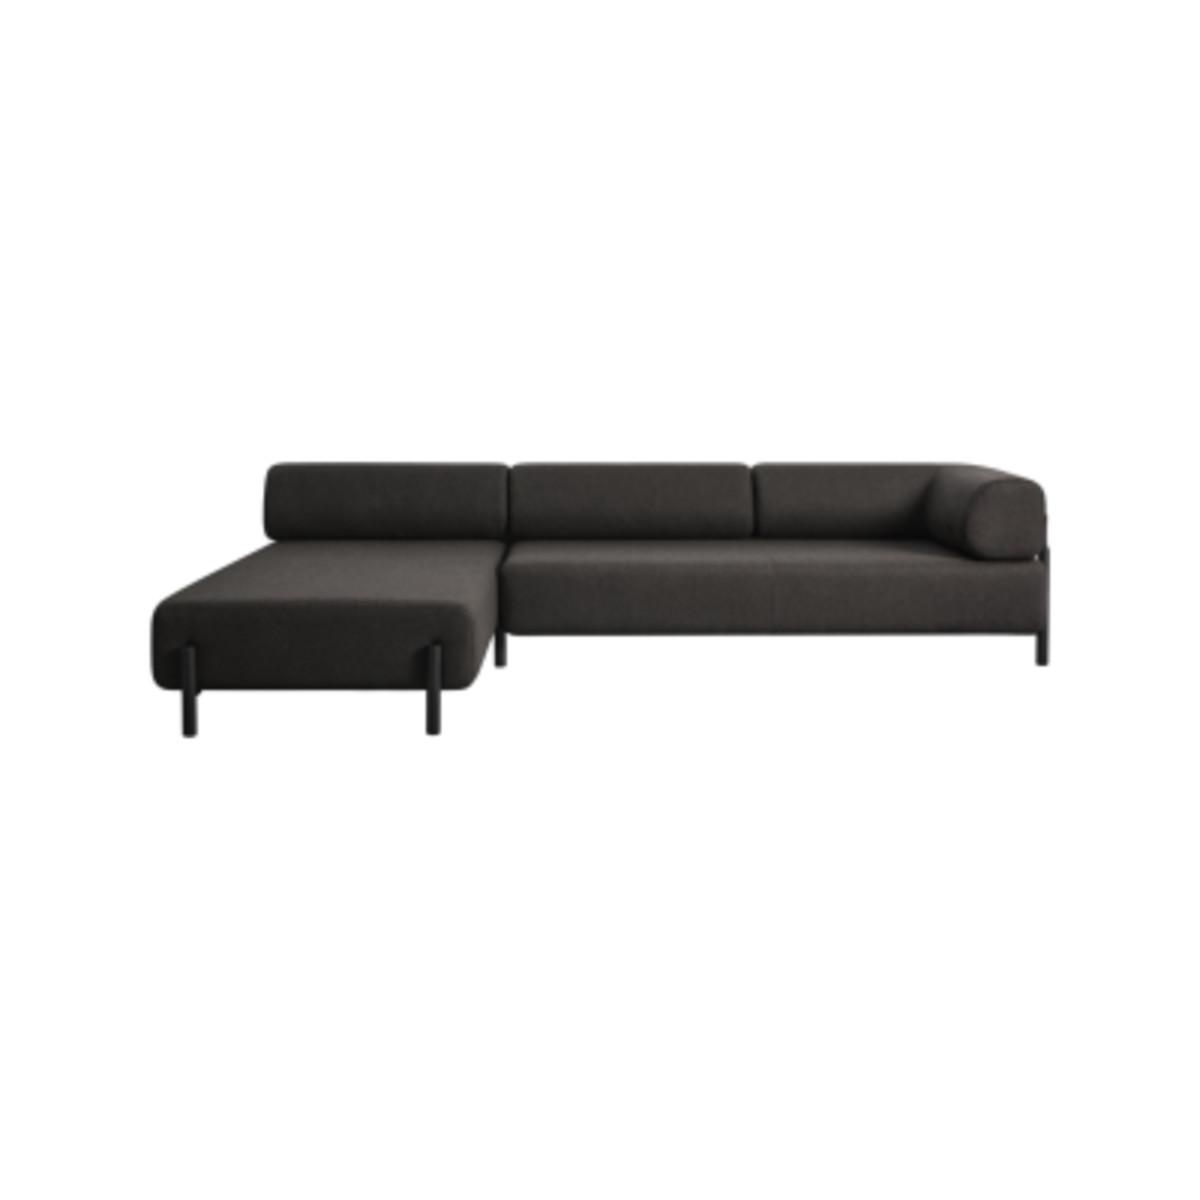 Sensational Shop Palo Corner Sofa Left Cjindustries Chair Design For Home Cjindustriesco